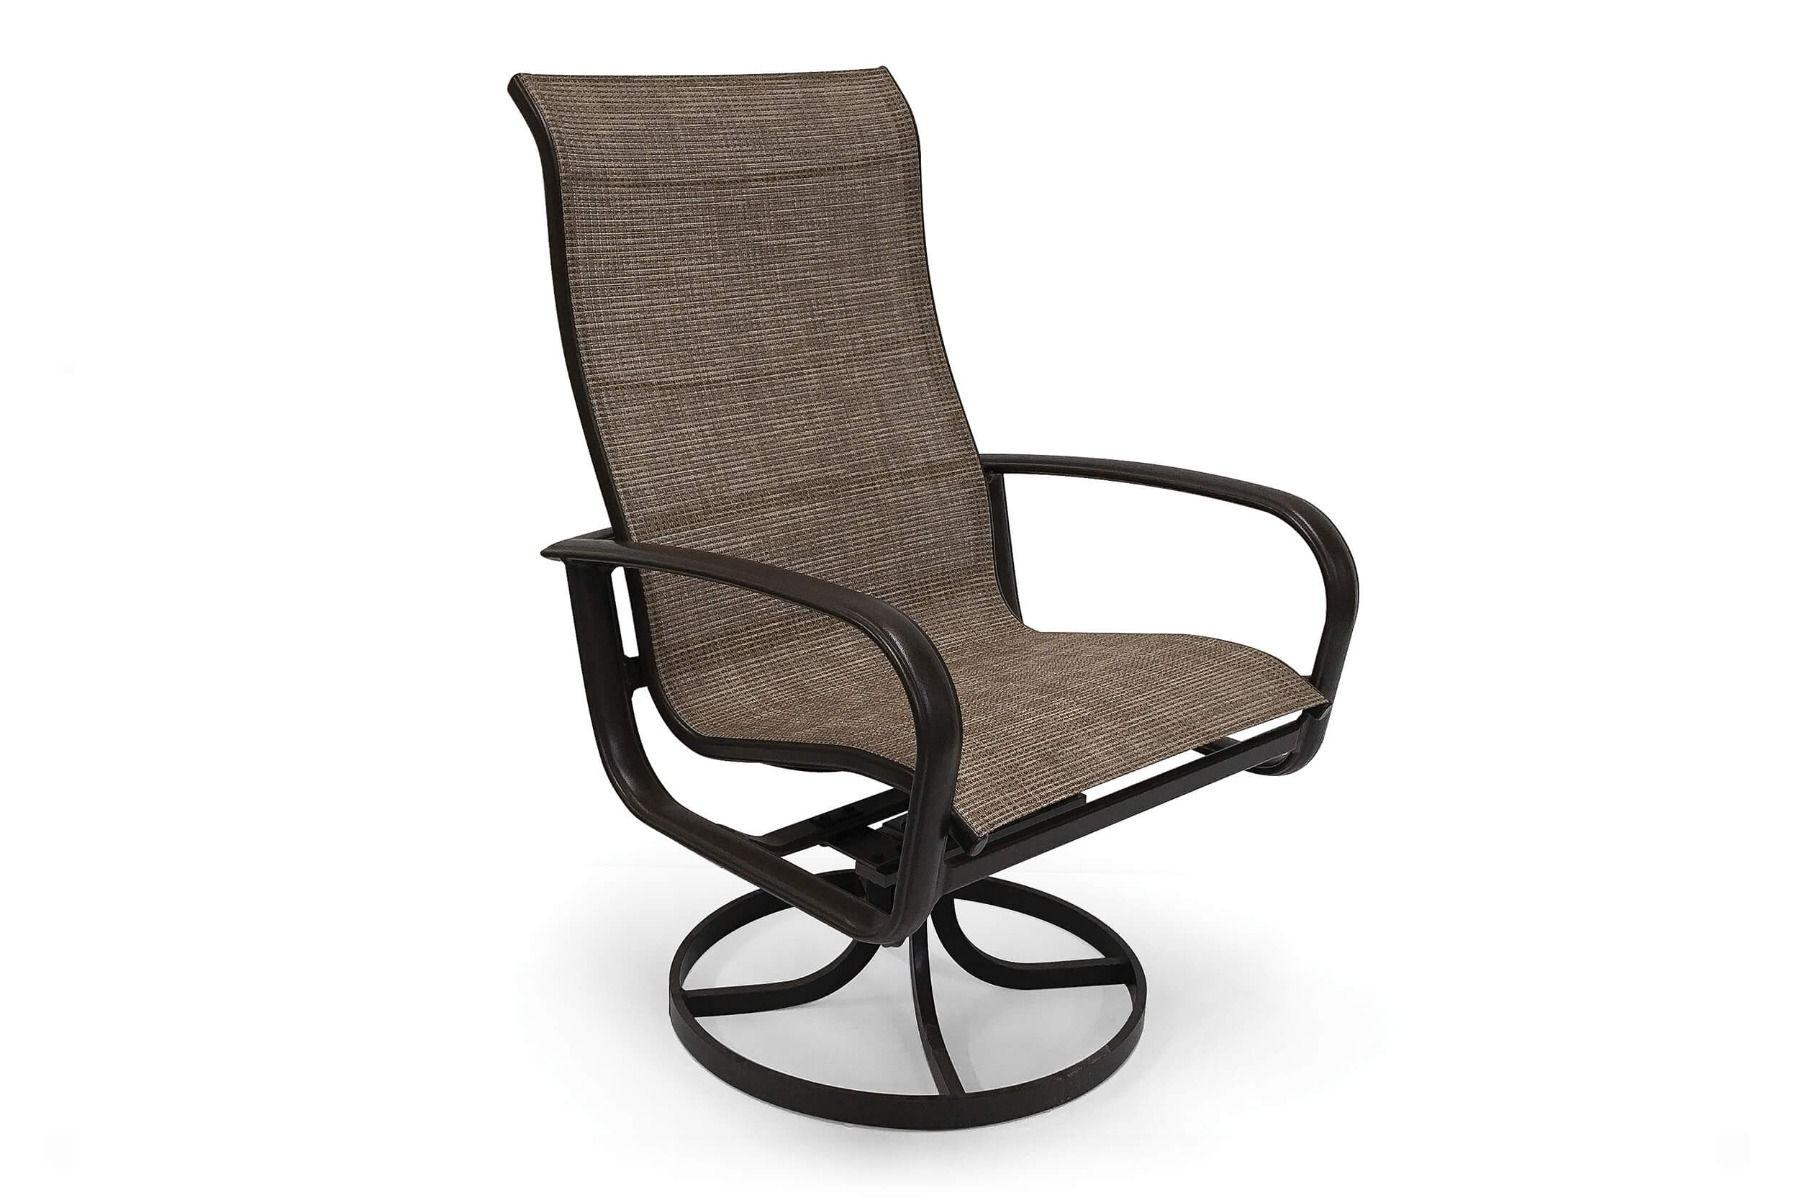 Savoy Sling Ultimate High Back Swivel Tilt Dining Chair (2Pk) Inside Sling High Back Swivel Chairs (View 19 of 25)